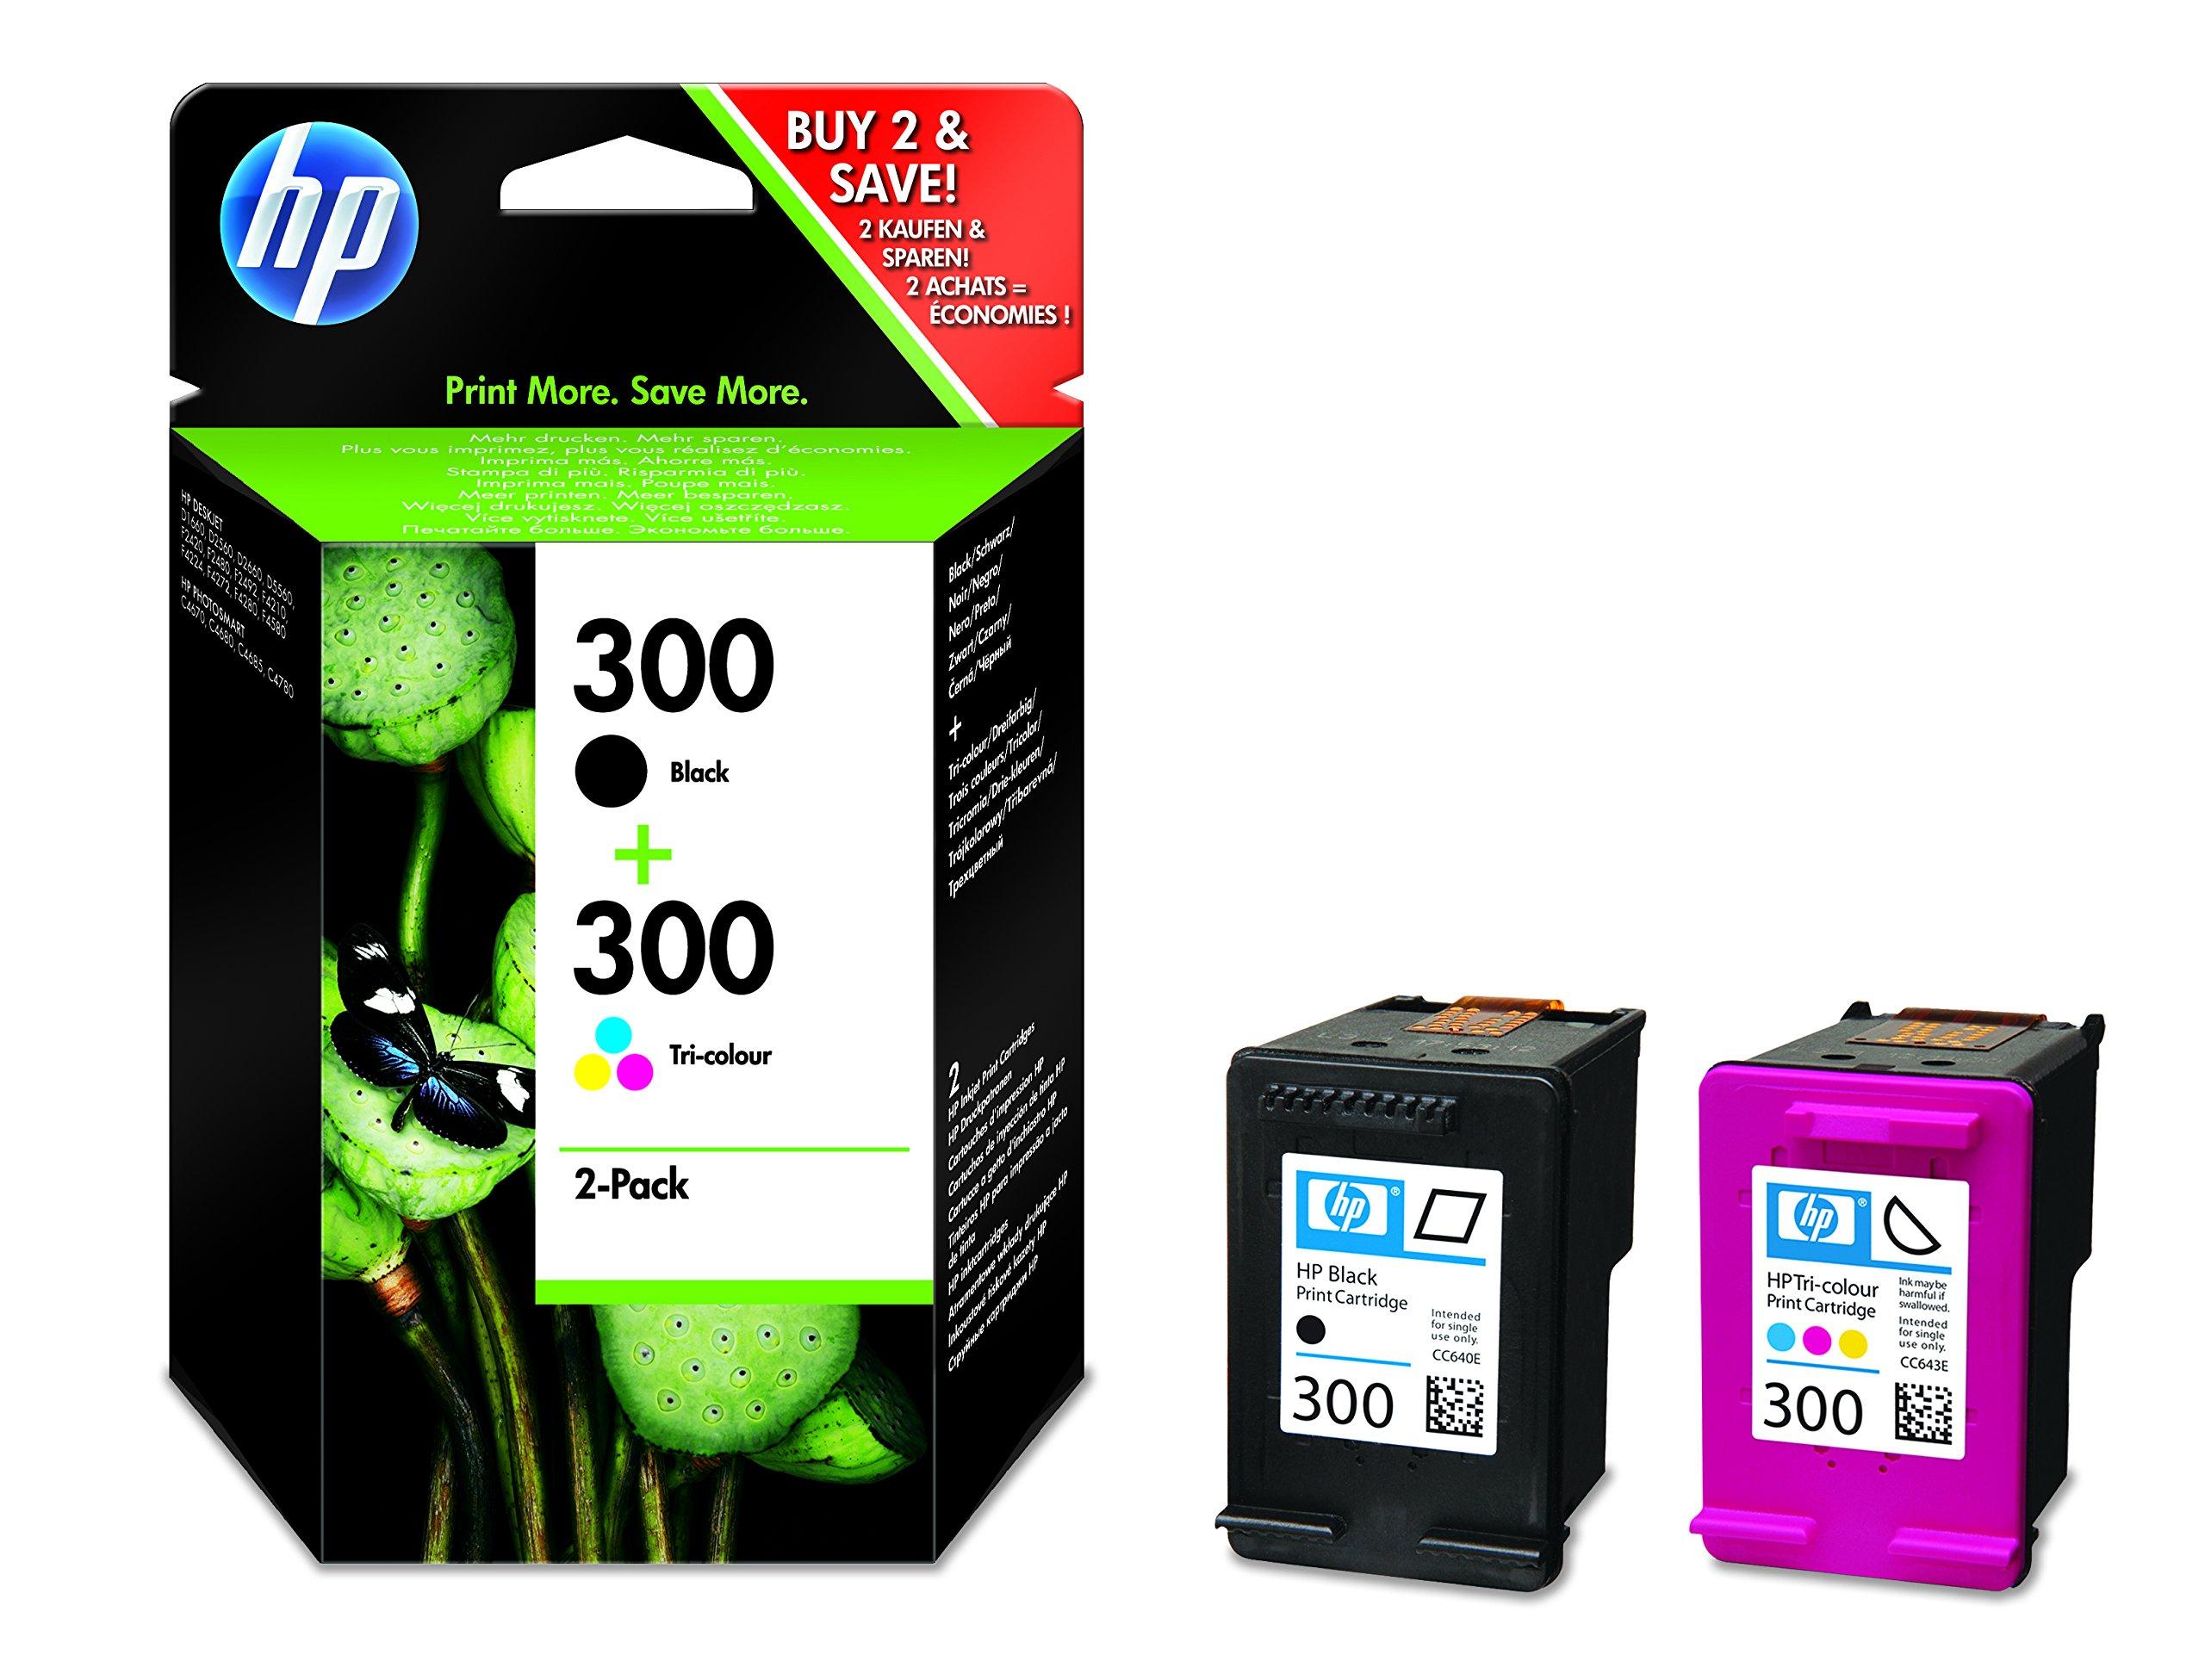 HP-300-Schwarz-Original-Druckerpatrone-fr-HP-Deskjet-HP-ENVY-HP-Photosmart